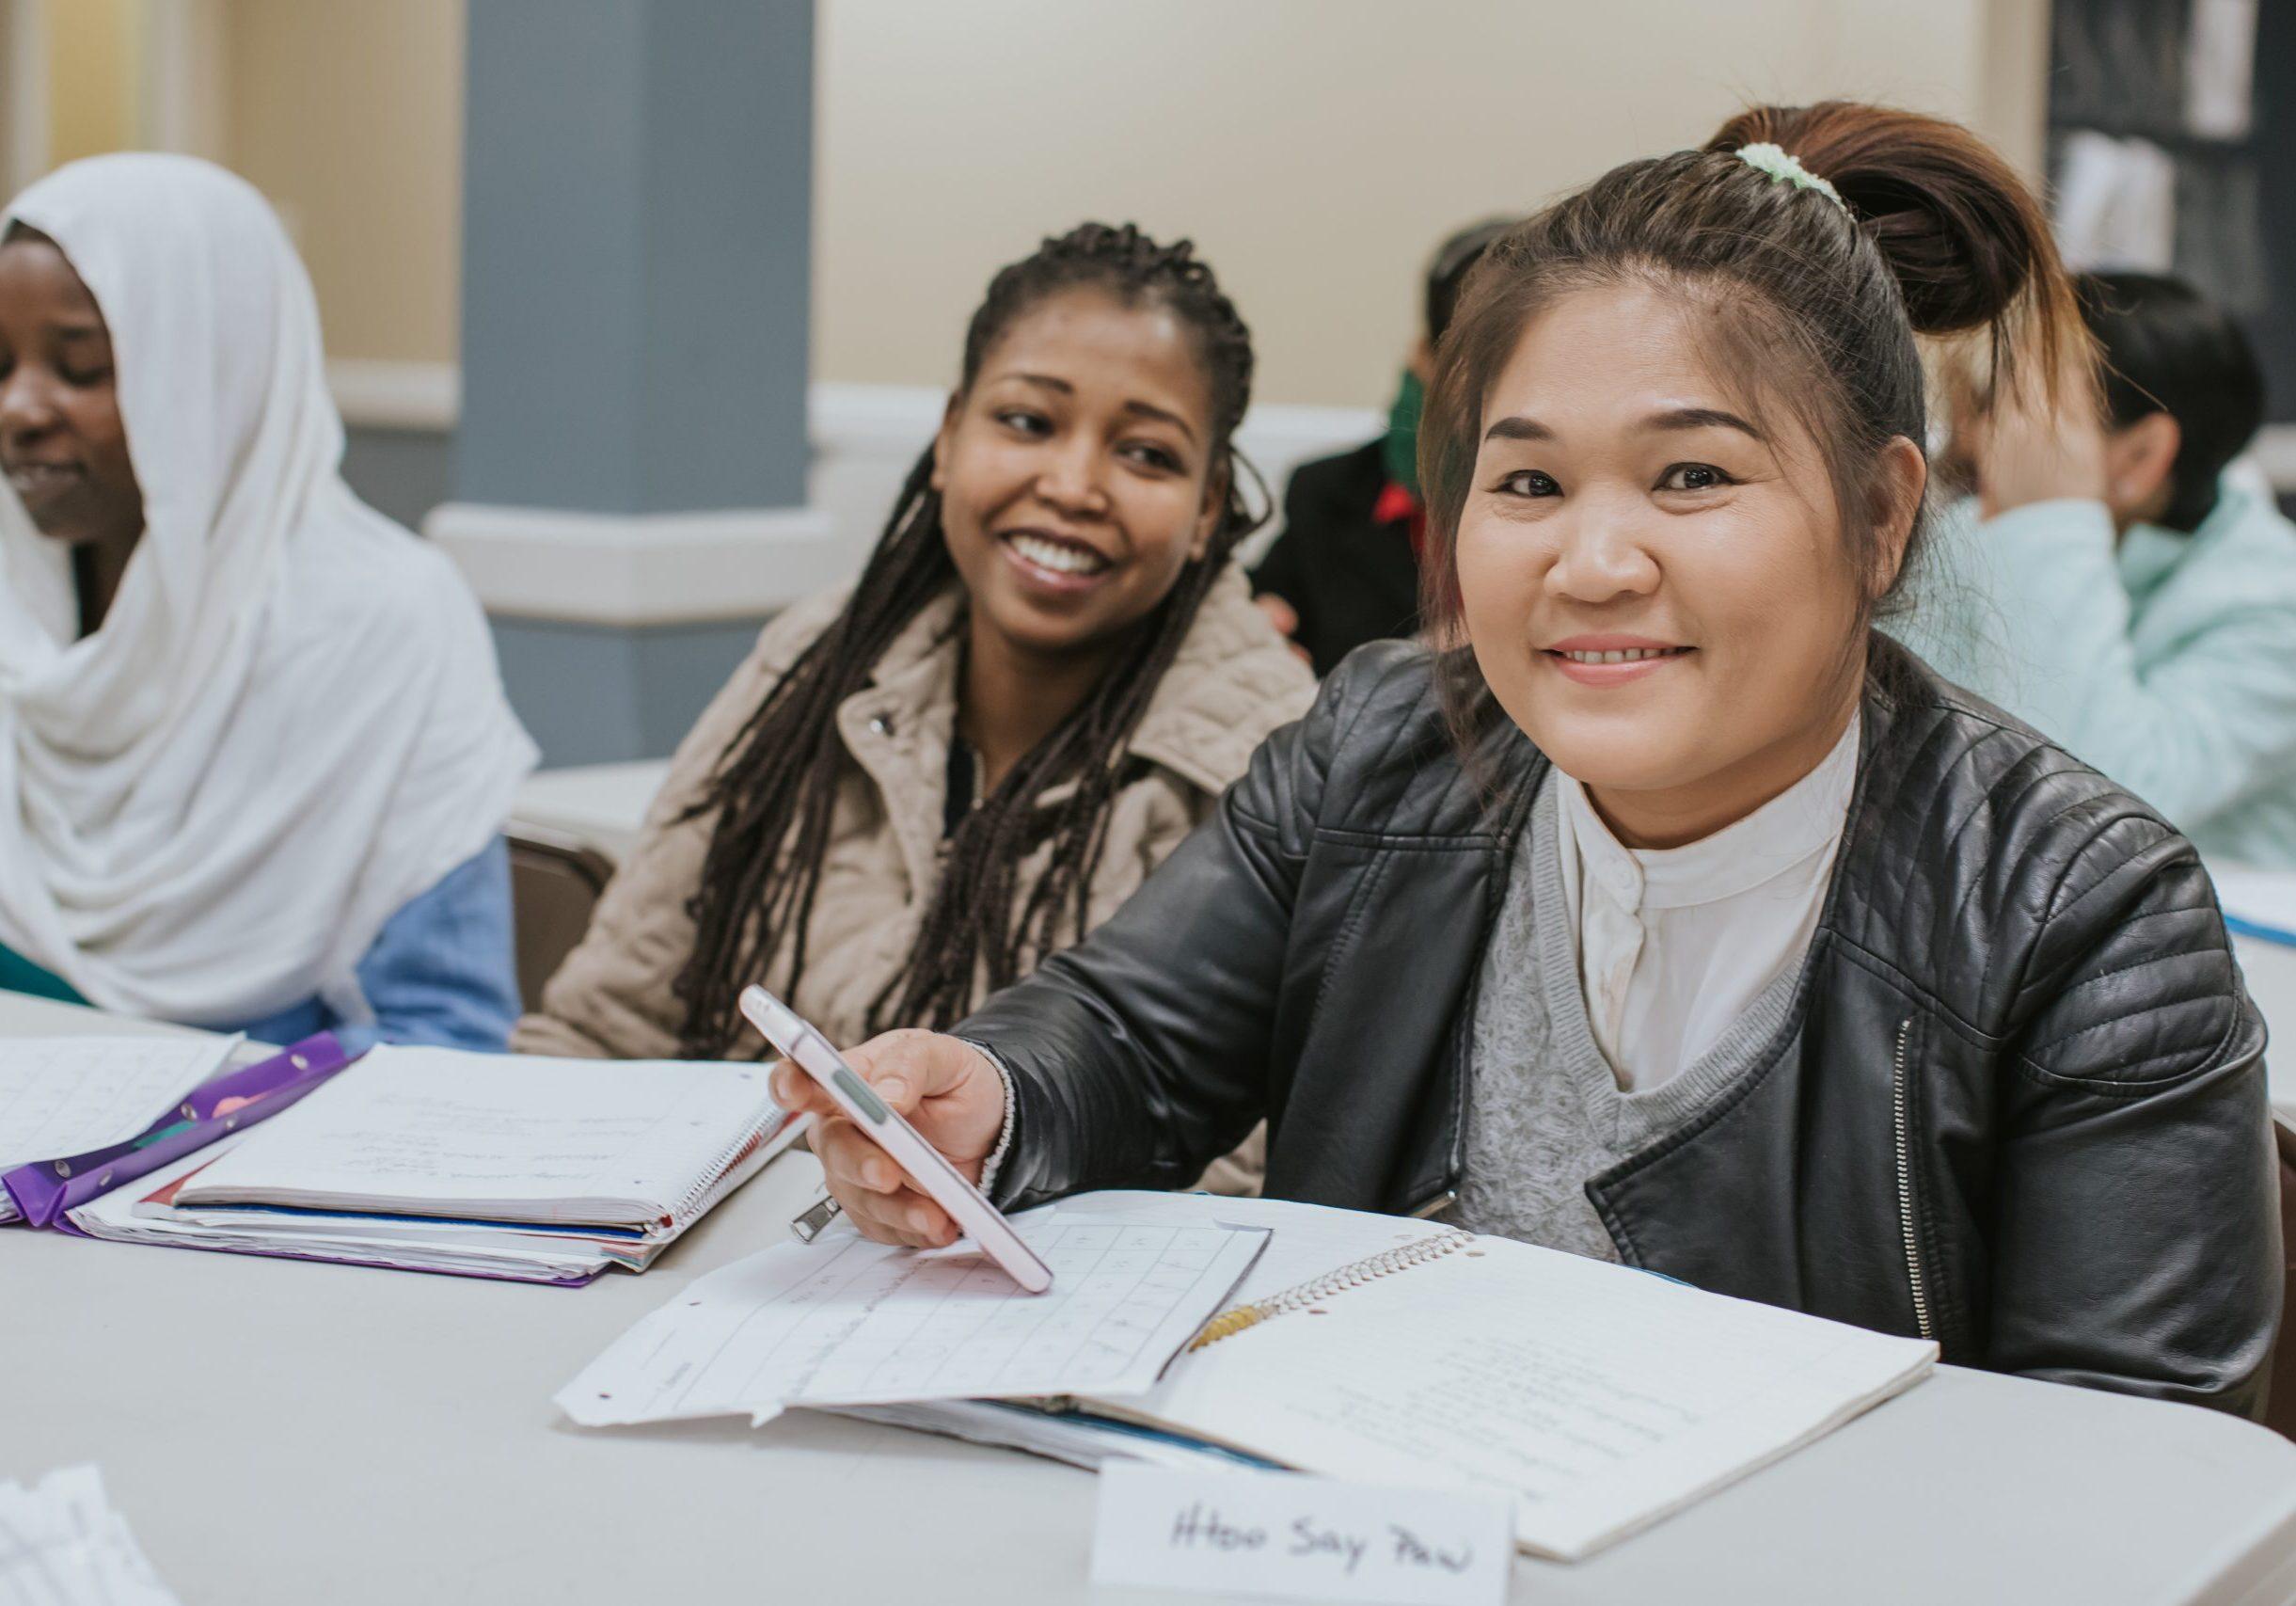 Women smiling in classroom